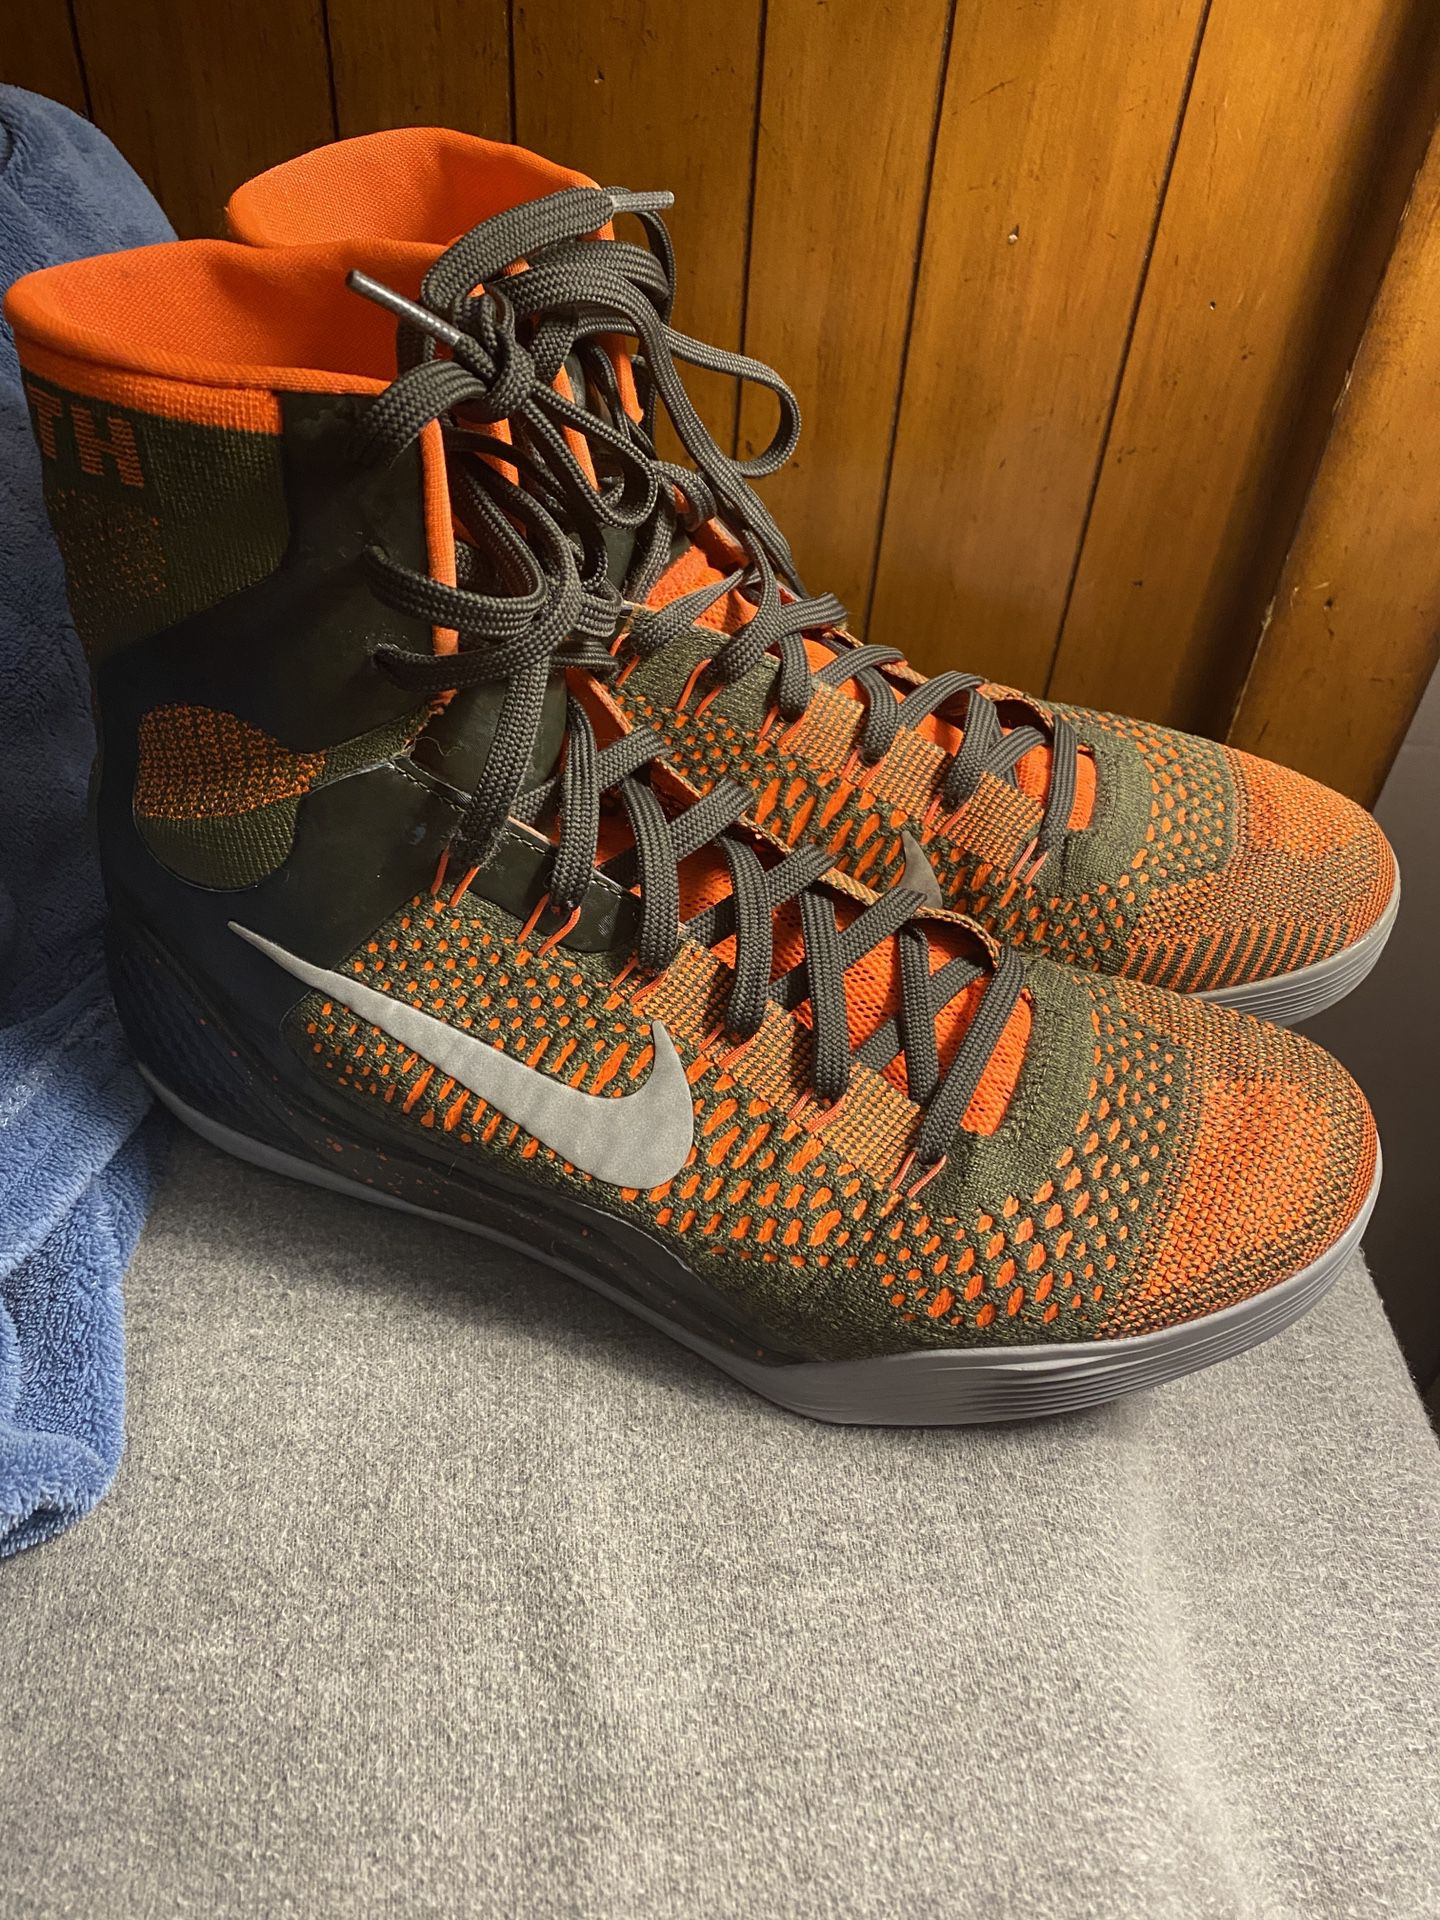 Kobe 9 elite high neon orange and army green